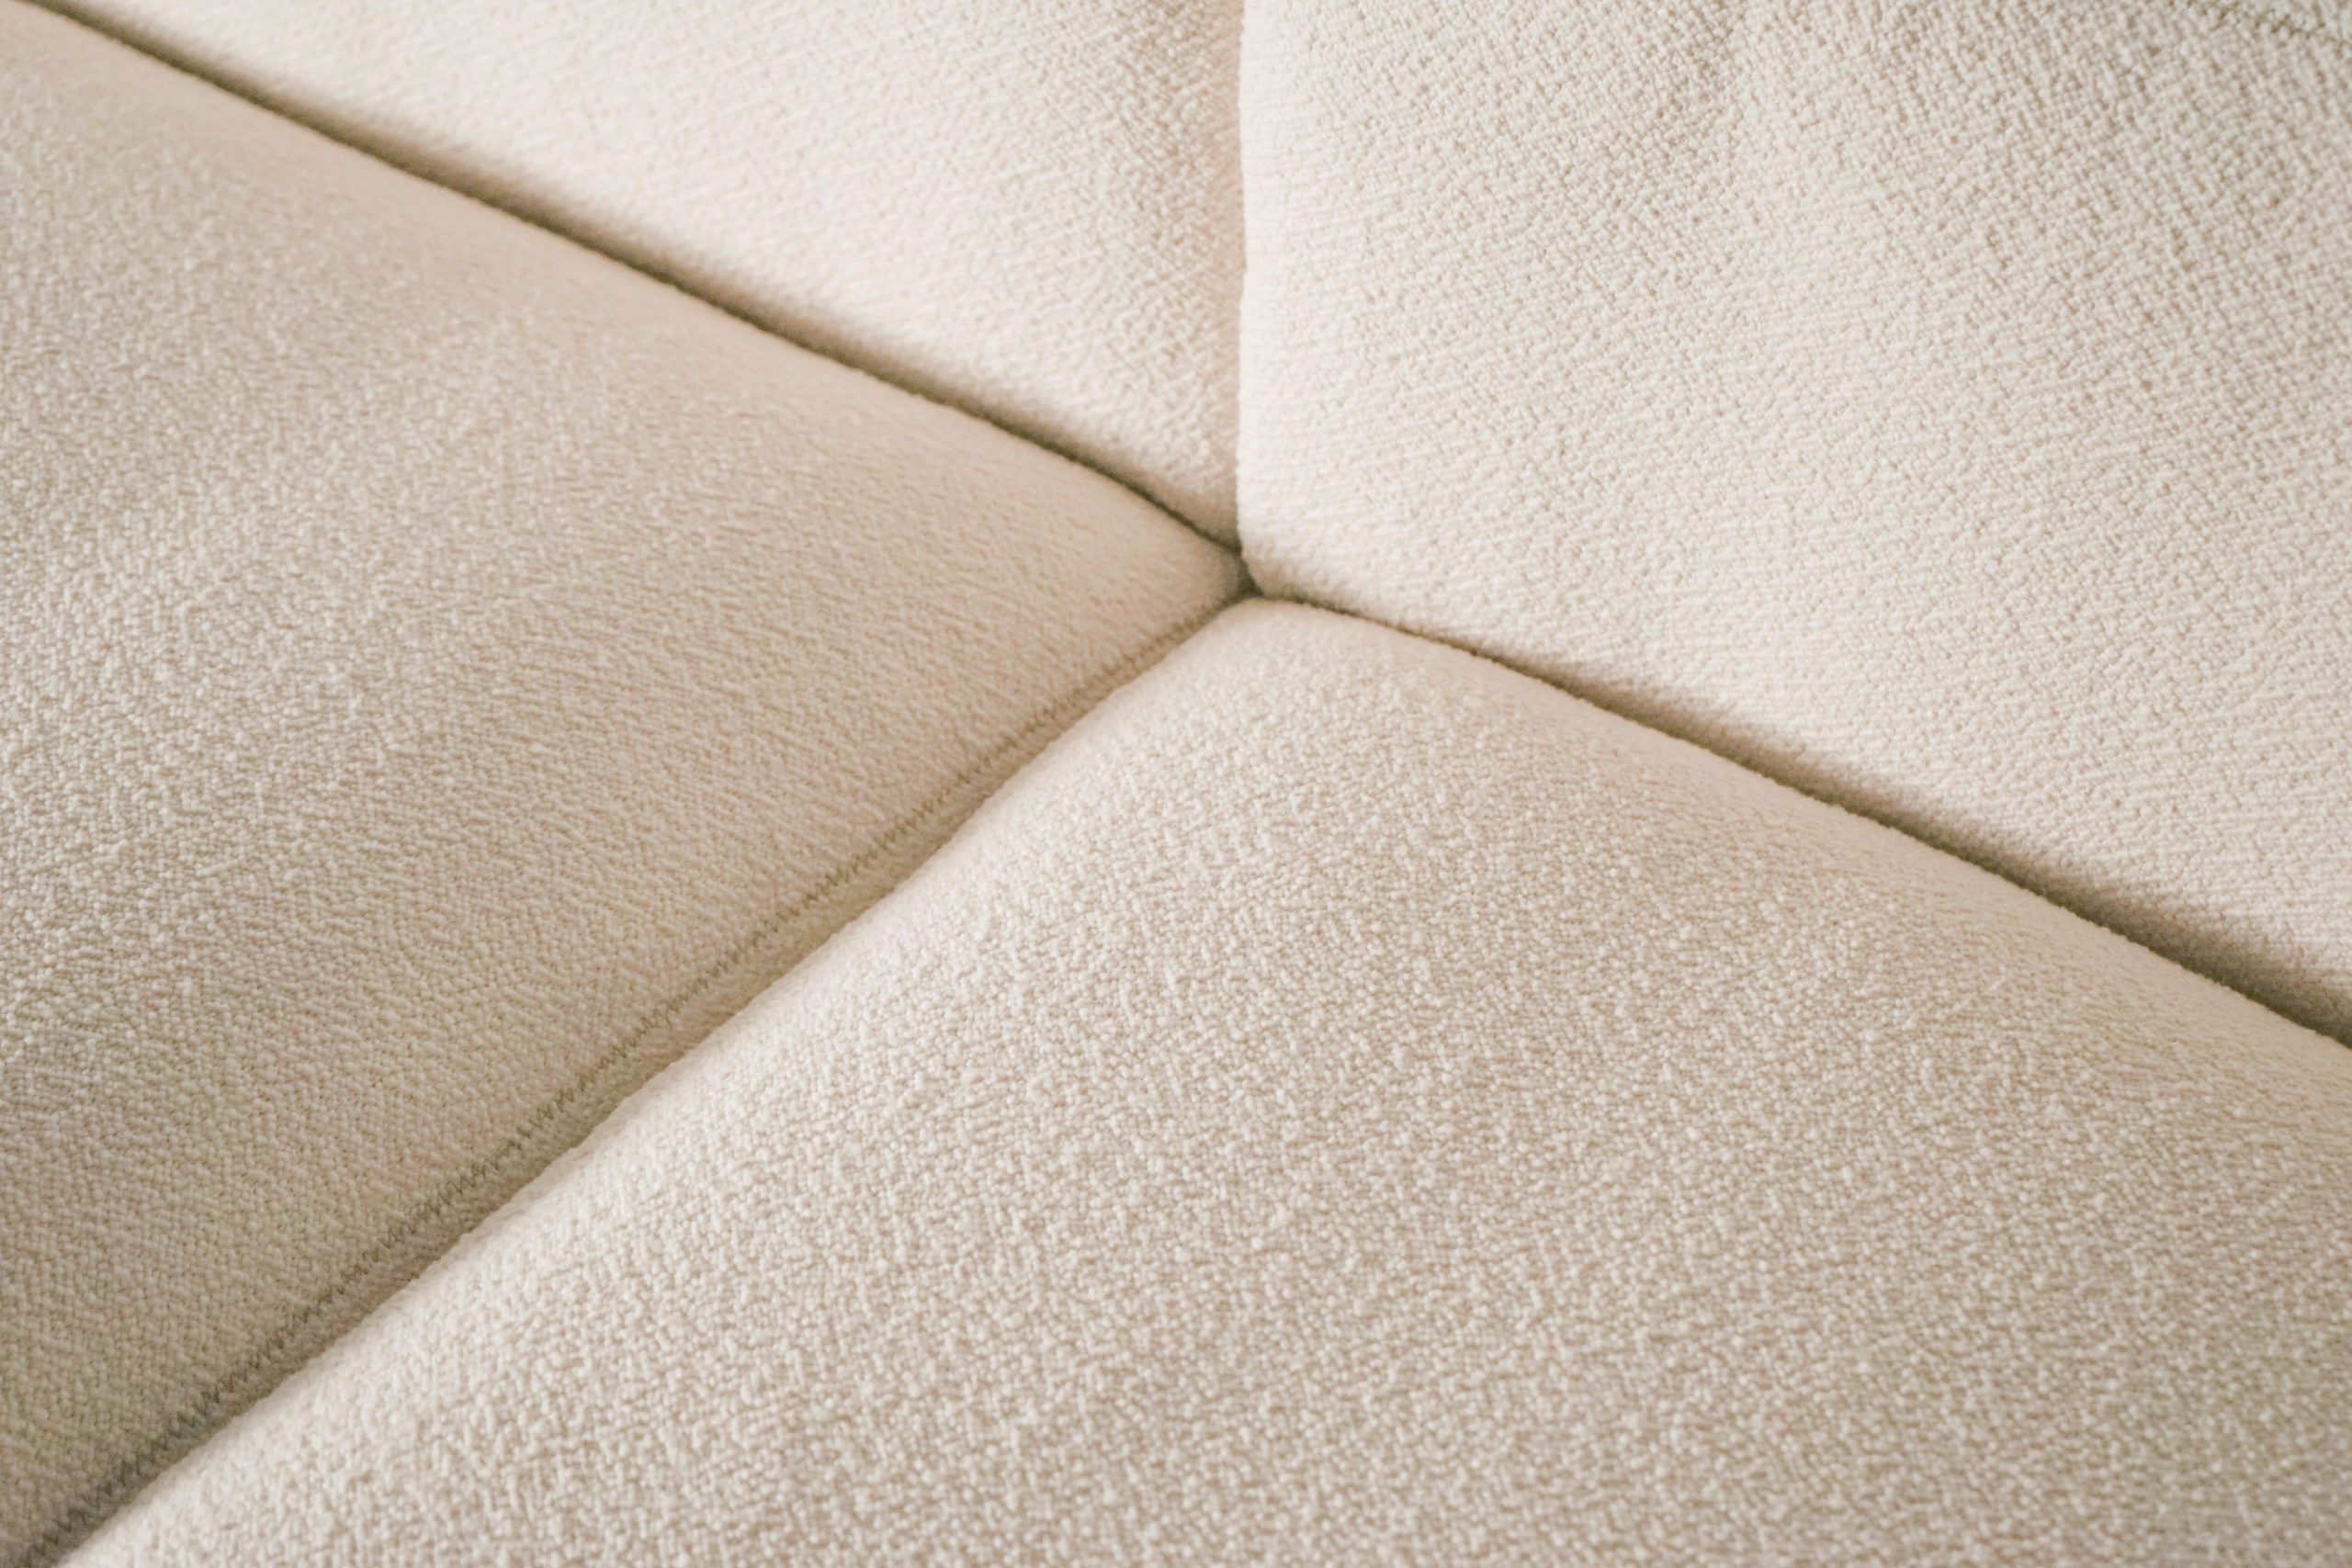 sofa grande de tres plazas